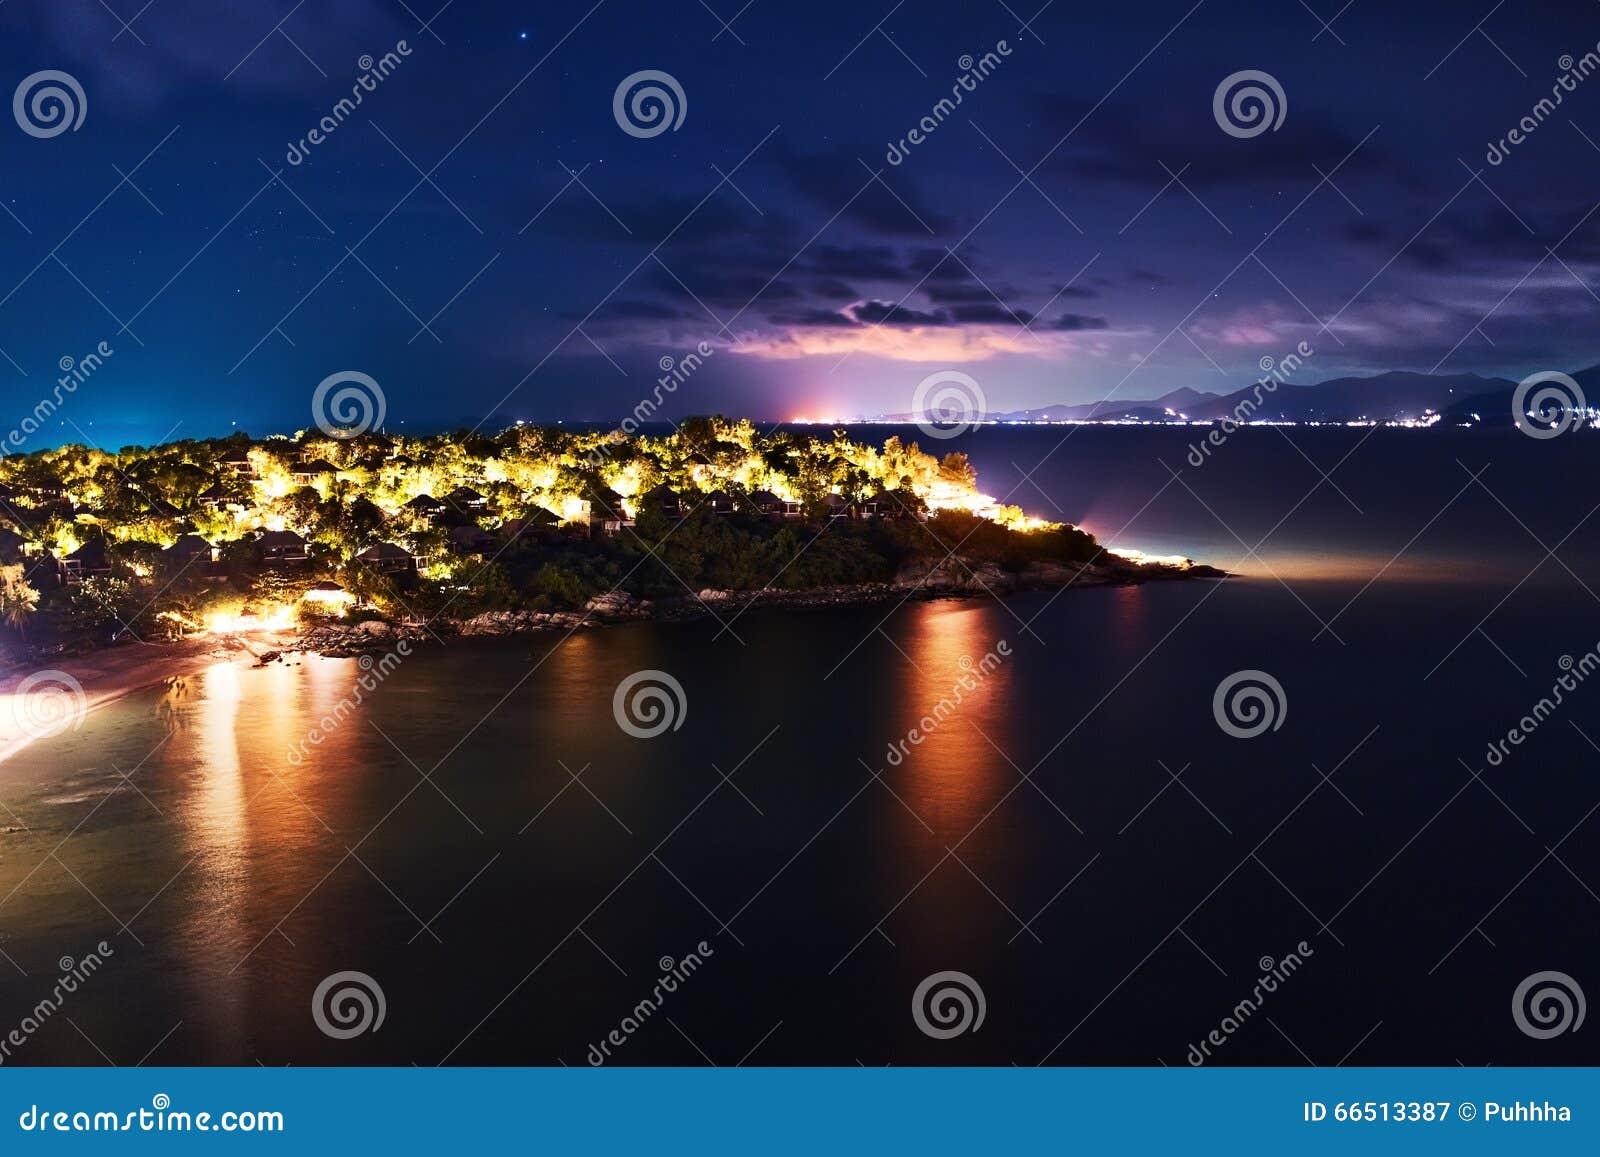 thailand landscape island at night beach lights nightlife ni